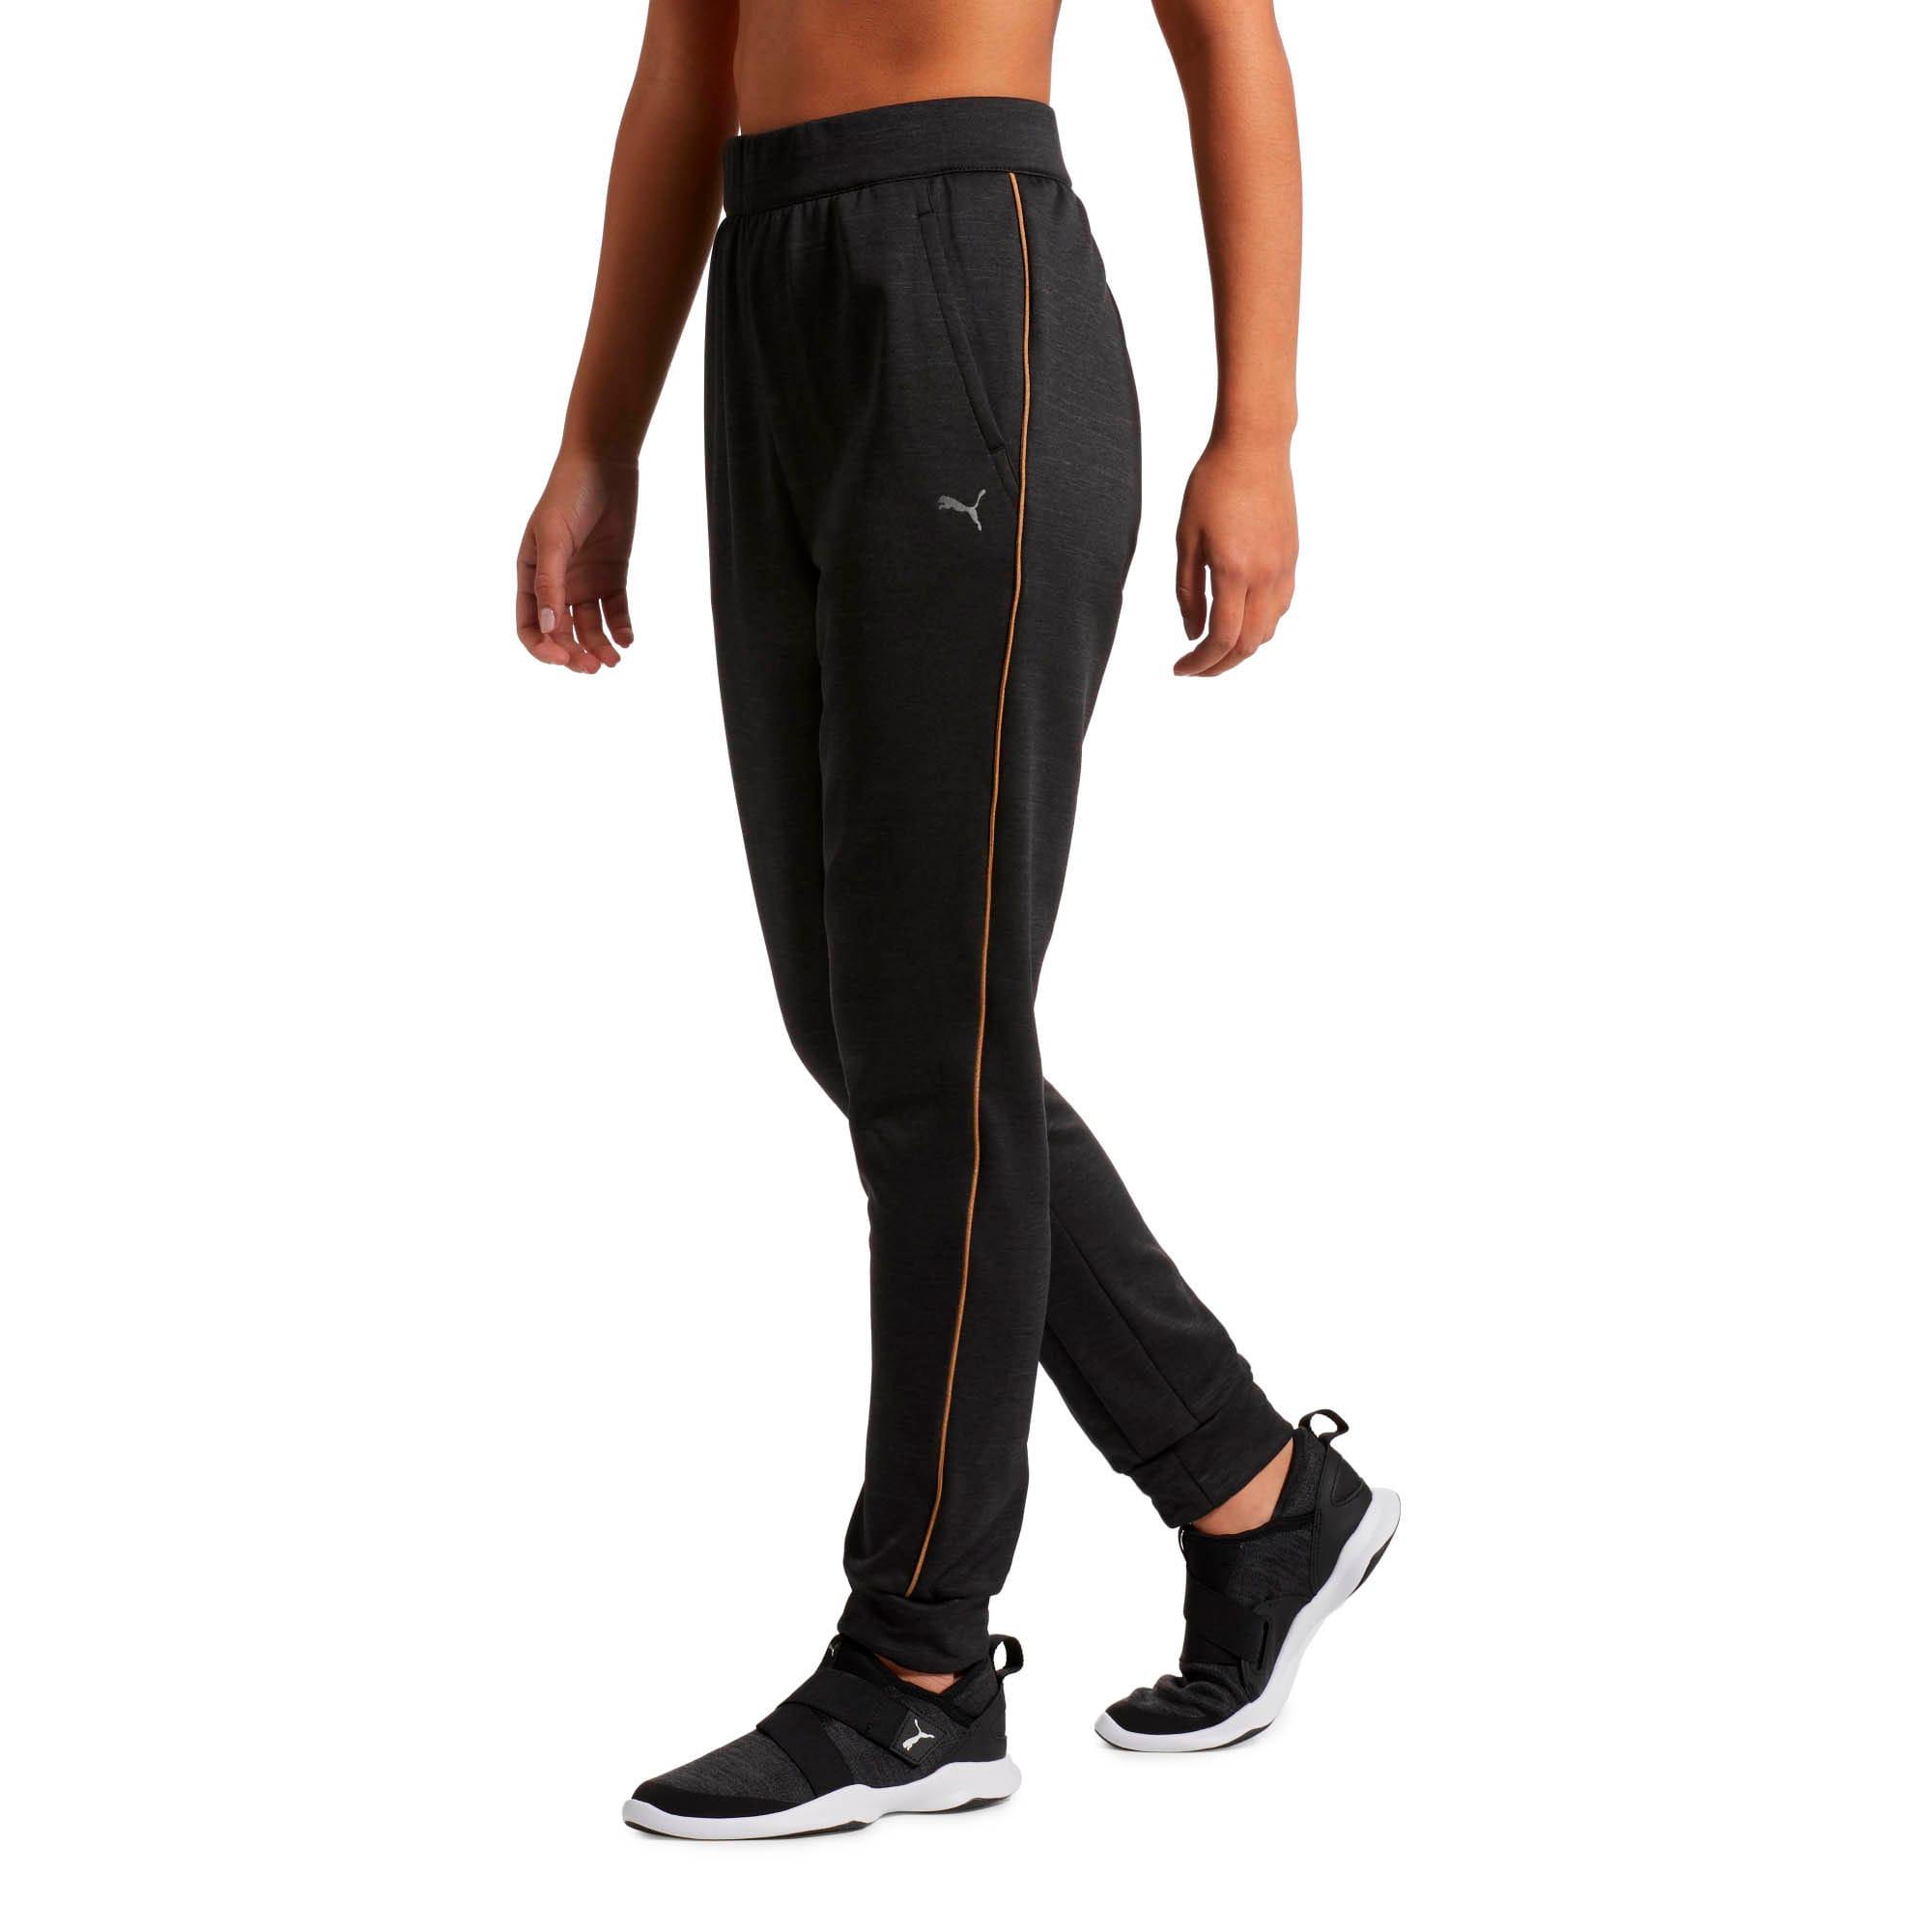 Thumbnail 2 of Be Ready Women's Sweatpants, Puma Black Heather, medium